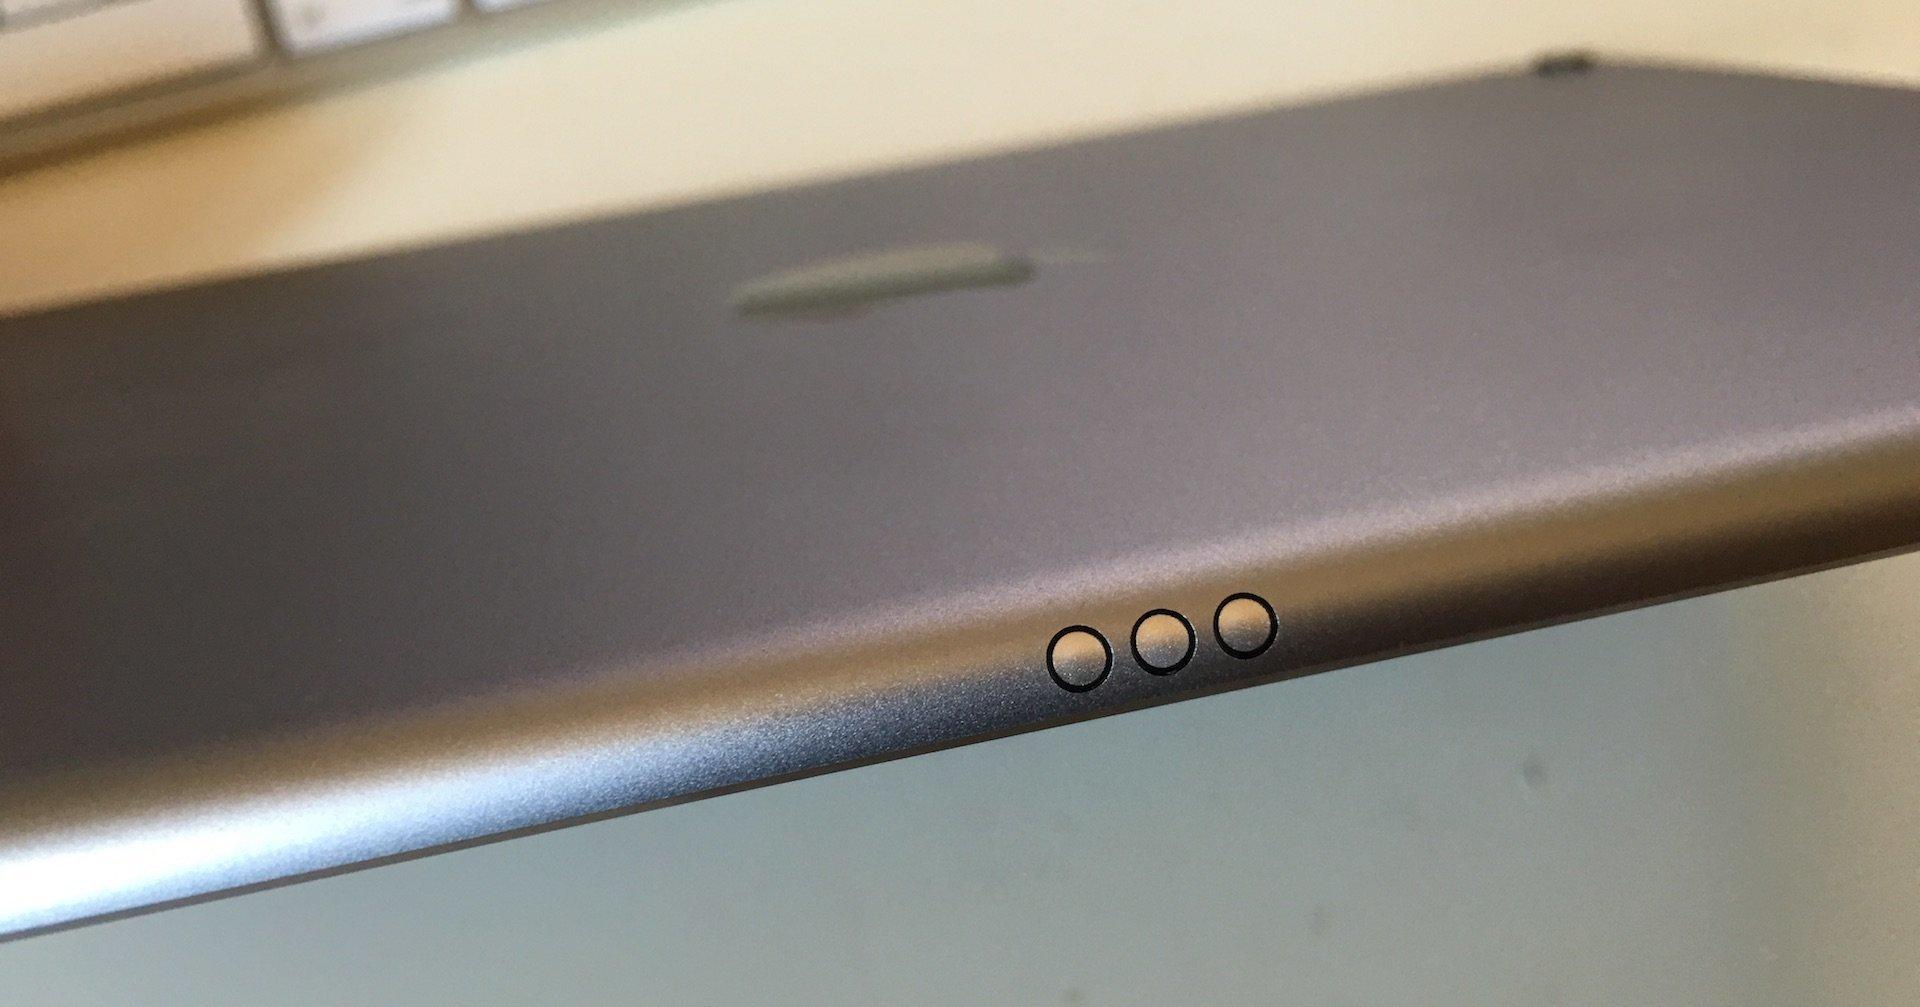 Gerücht: iPhone 7 ohne Smart Connector